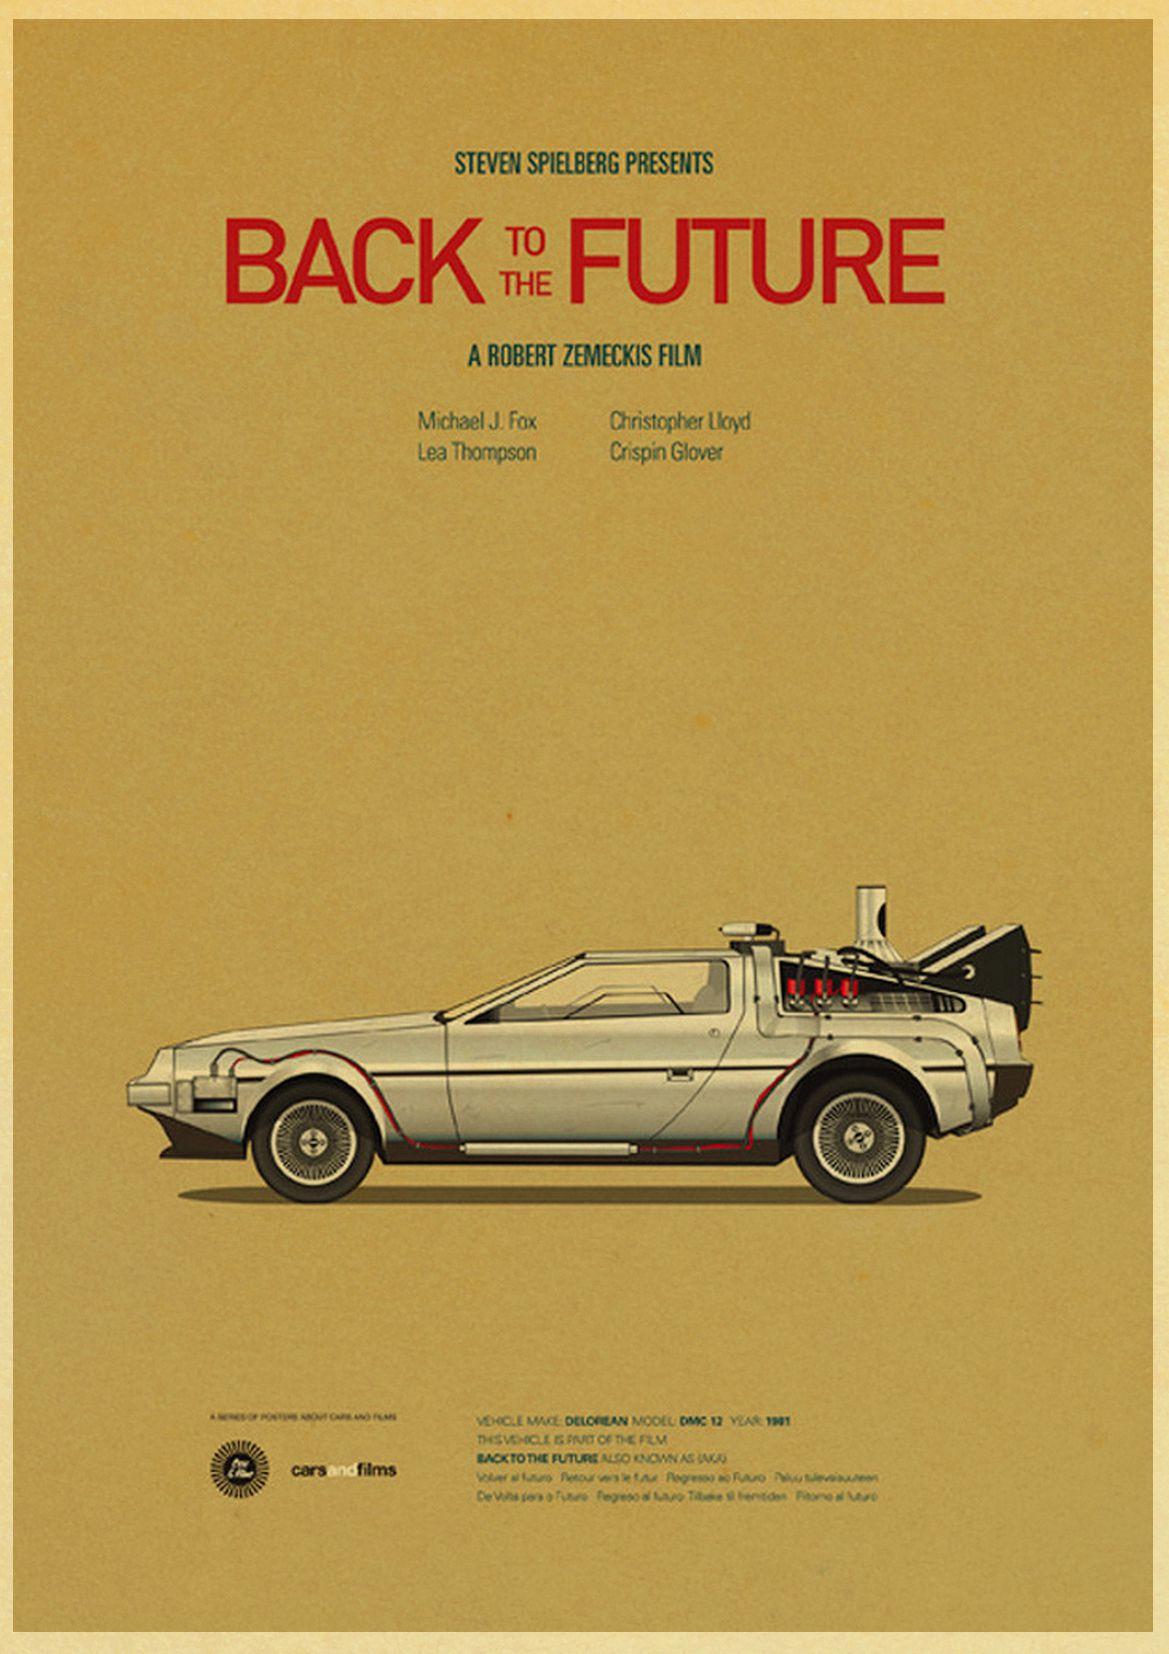 HTB1qev9leuSBuNjSsziq6zq8pXa5 Sci-fi Back to The Future Film Propaganda Retro Kraft Poster Decorative DIY Wall Canvas Sticker Home Bar Art Posters Decor